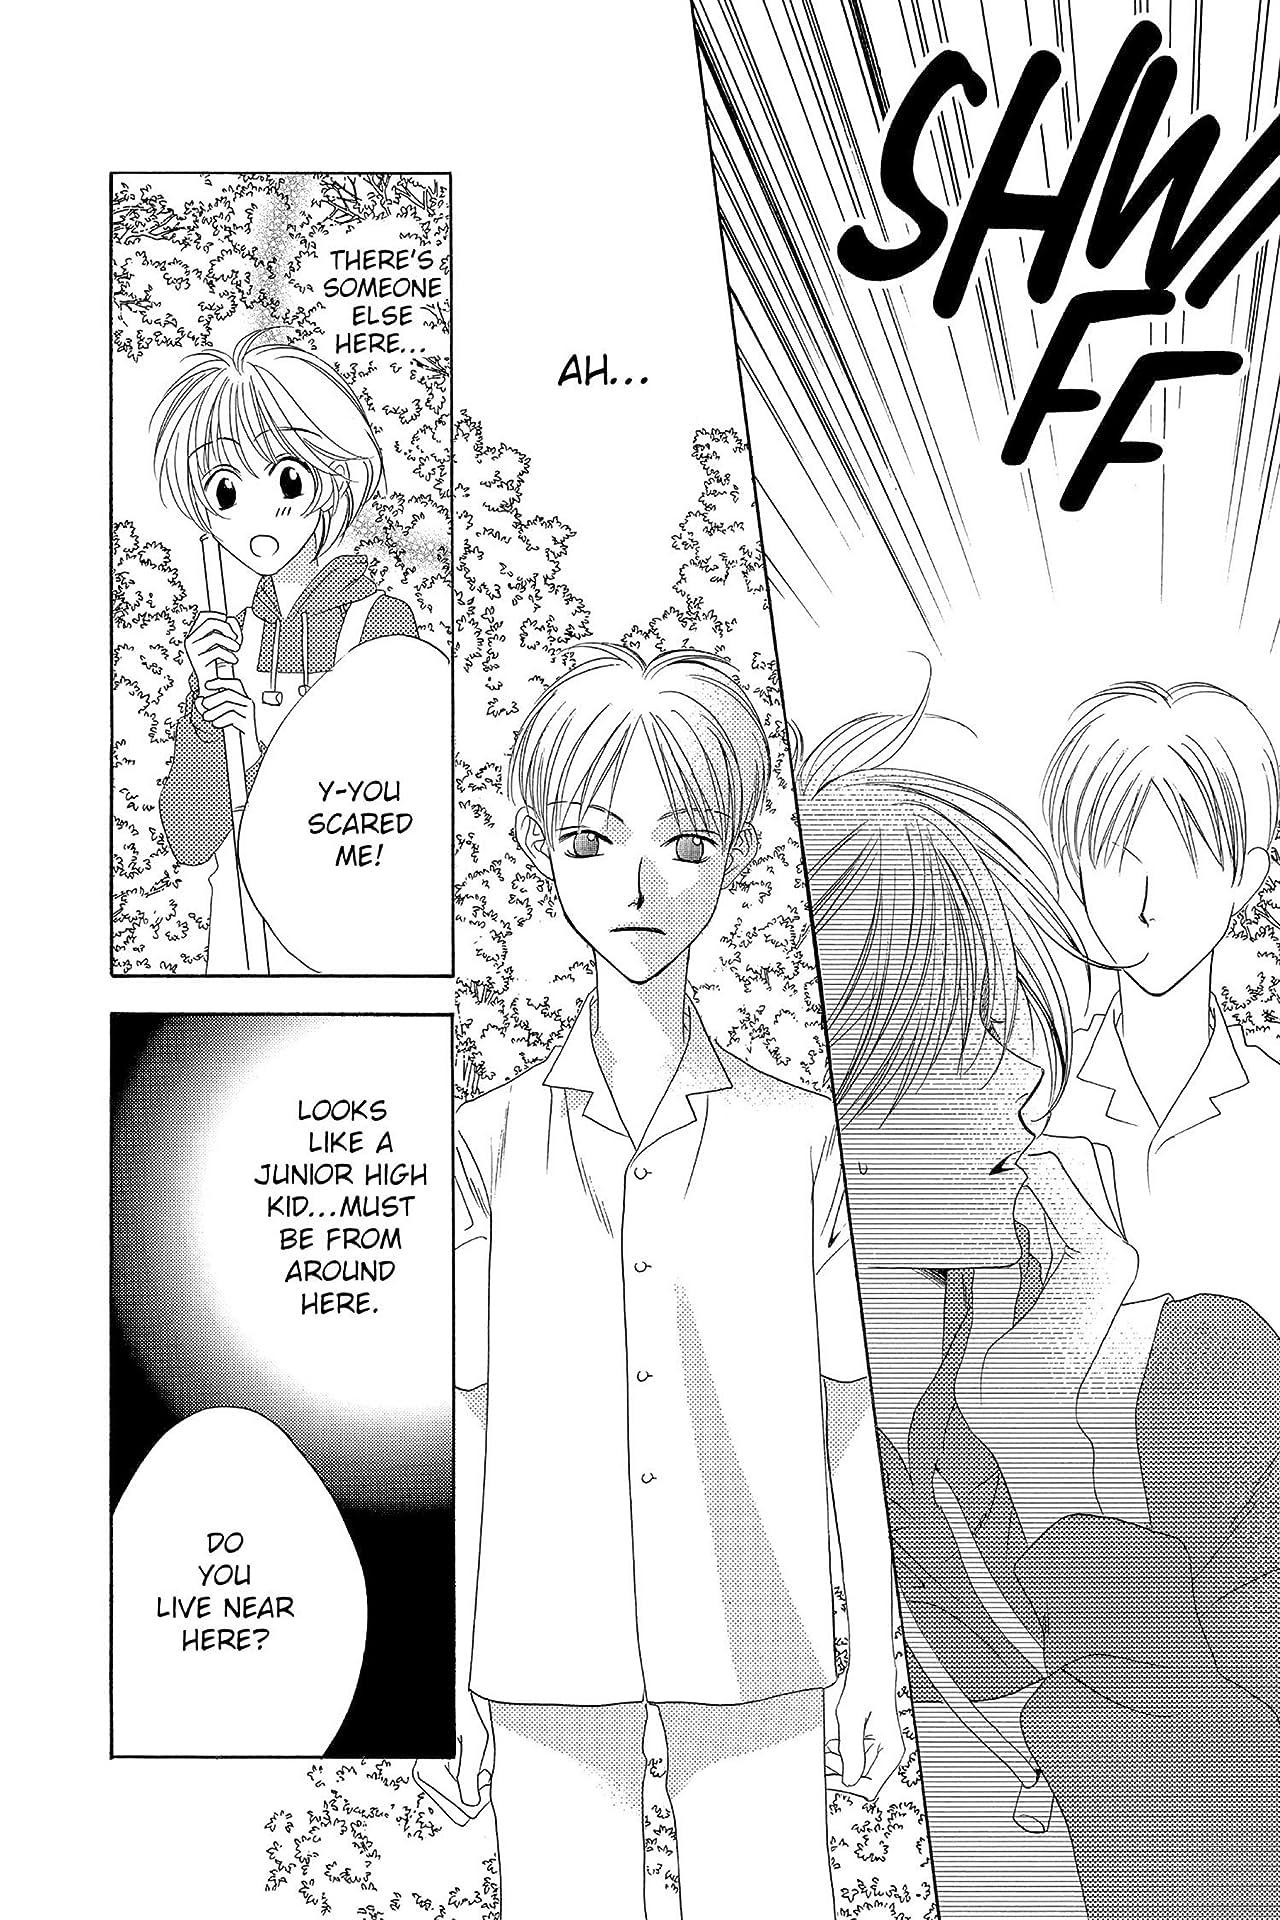 Hana-Kimi Vol. 11